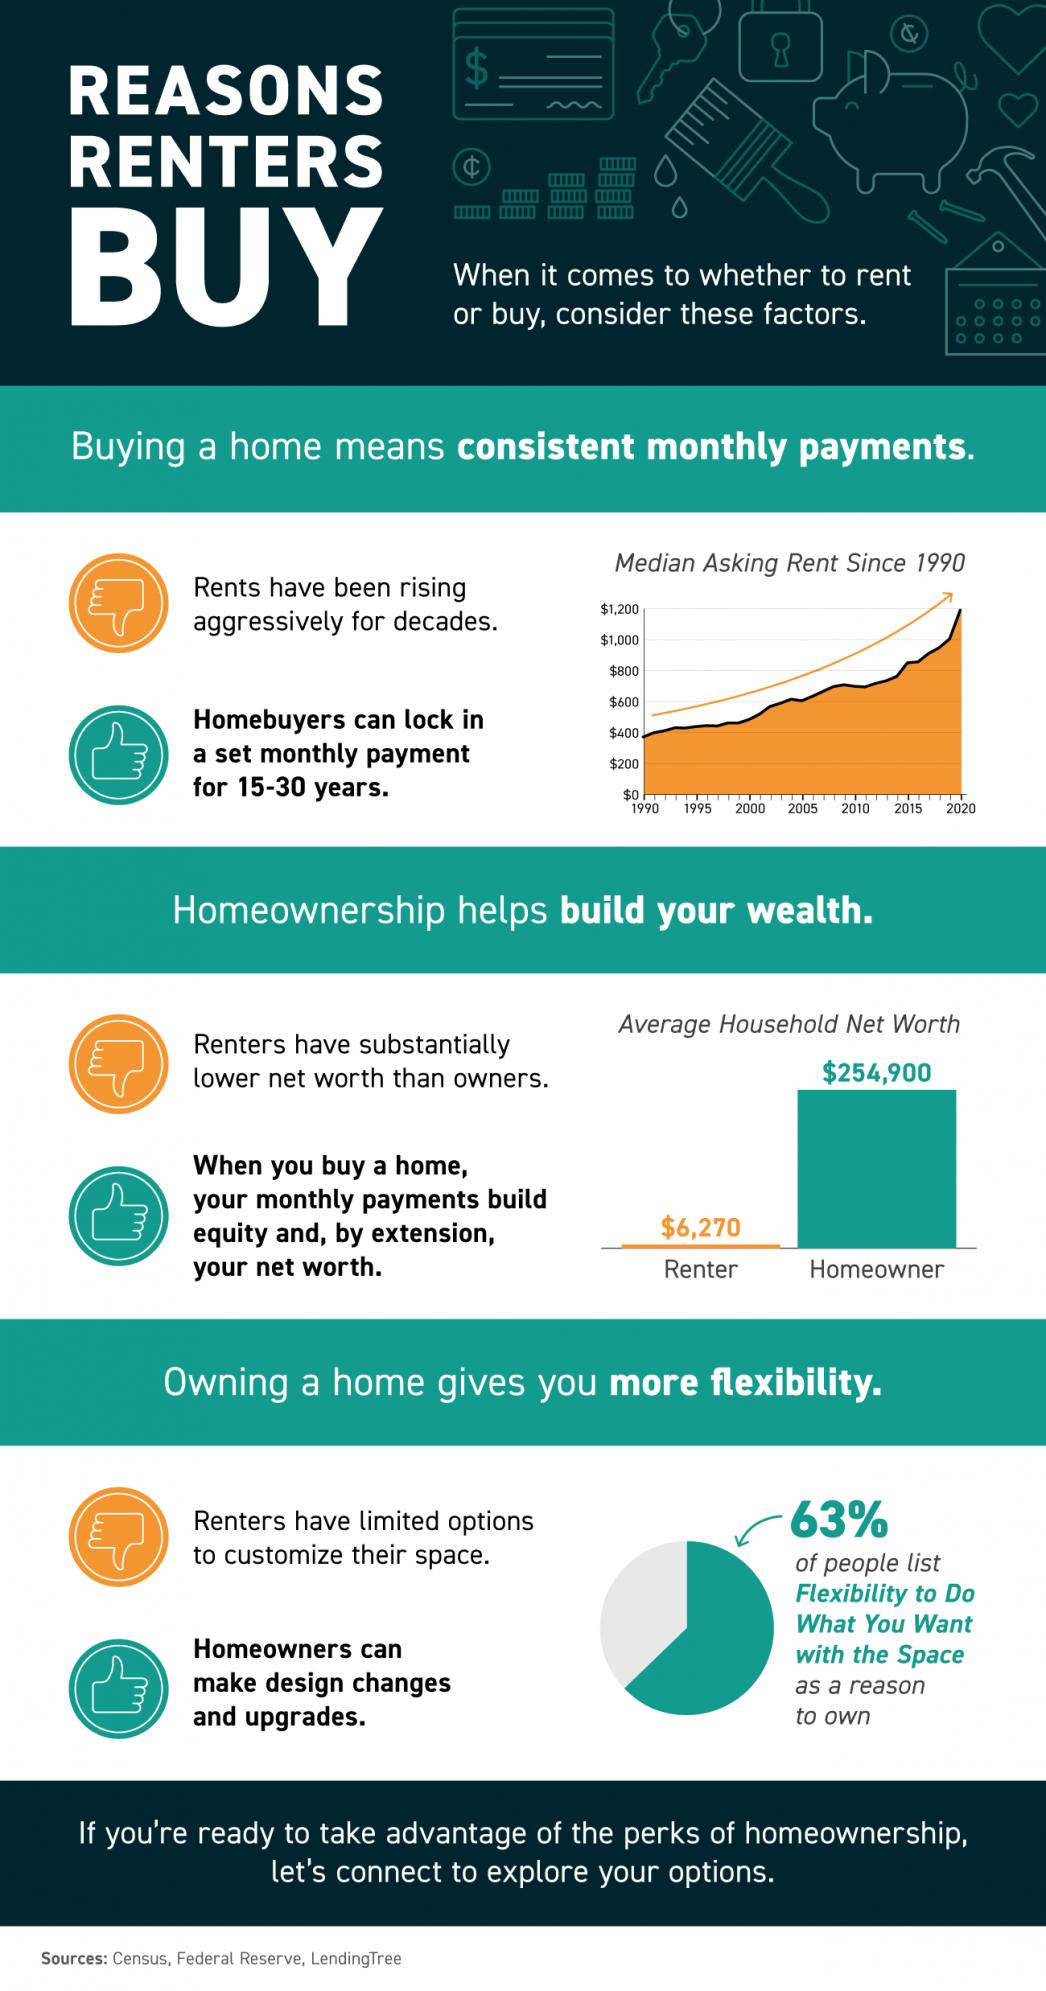 Reasons Renters Buy [INFOGRAPHIC] | MyKCM